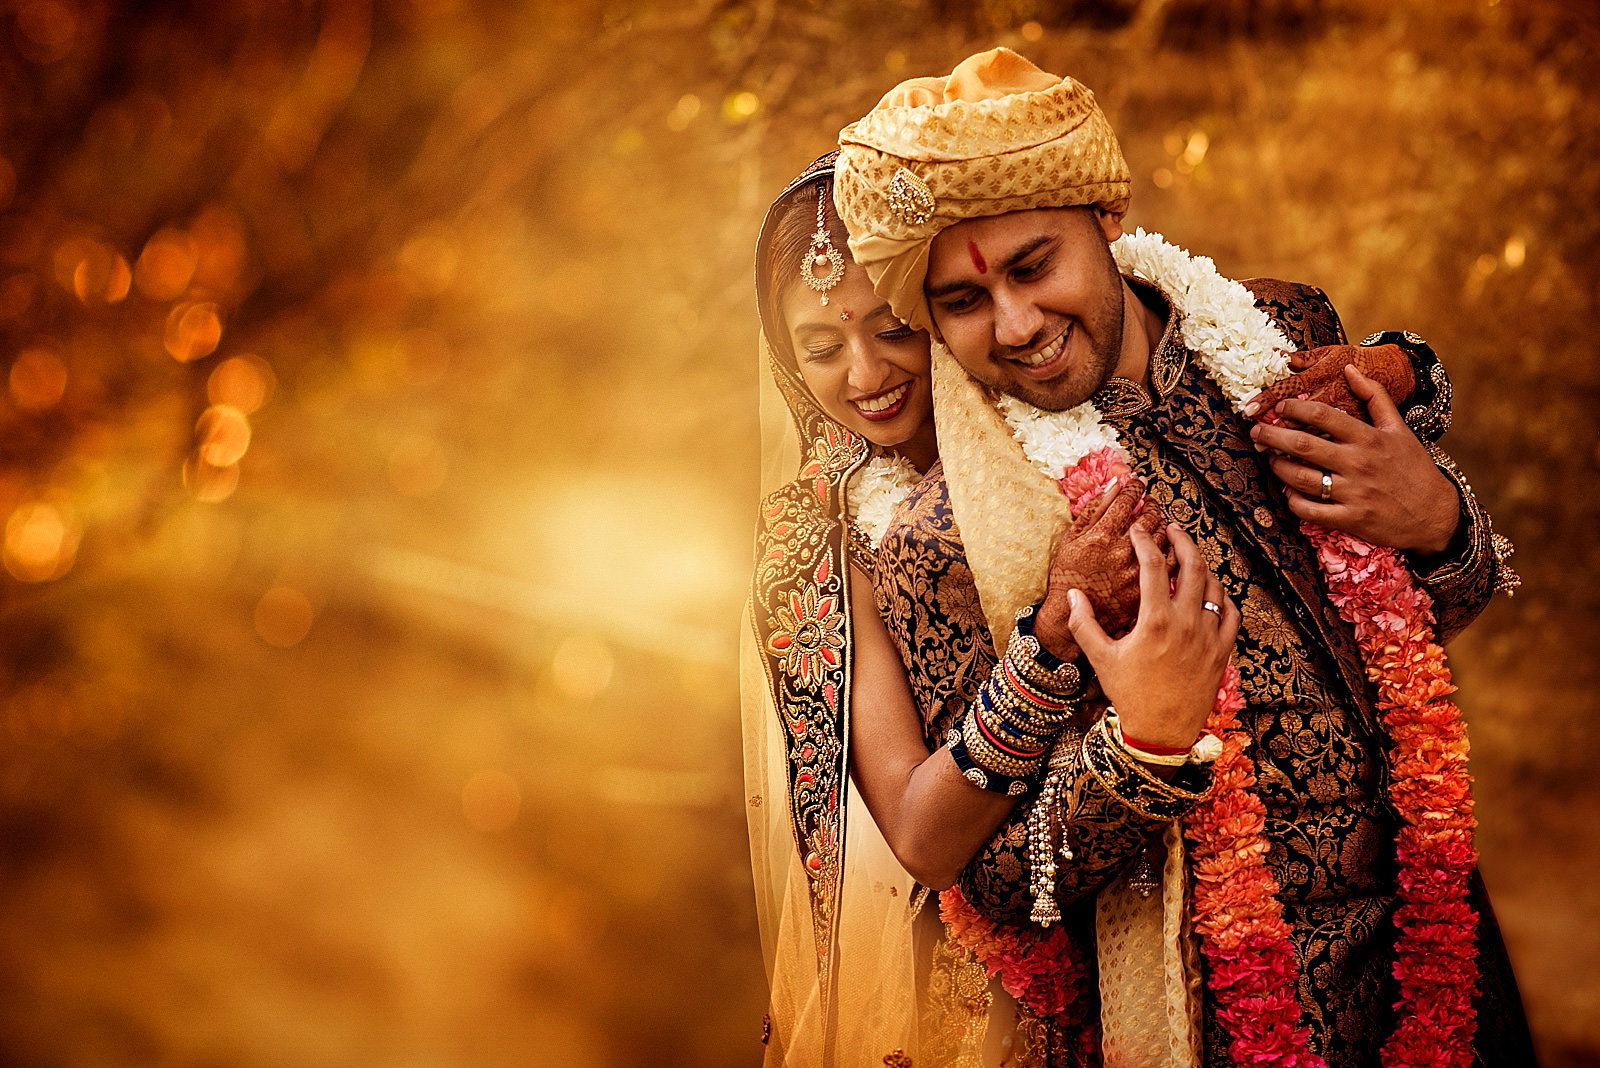 Jex-Estate-Hindu-Wedding-top-South-African-Wedding-Photographer-Jacki-Bruniquel-058-2057